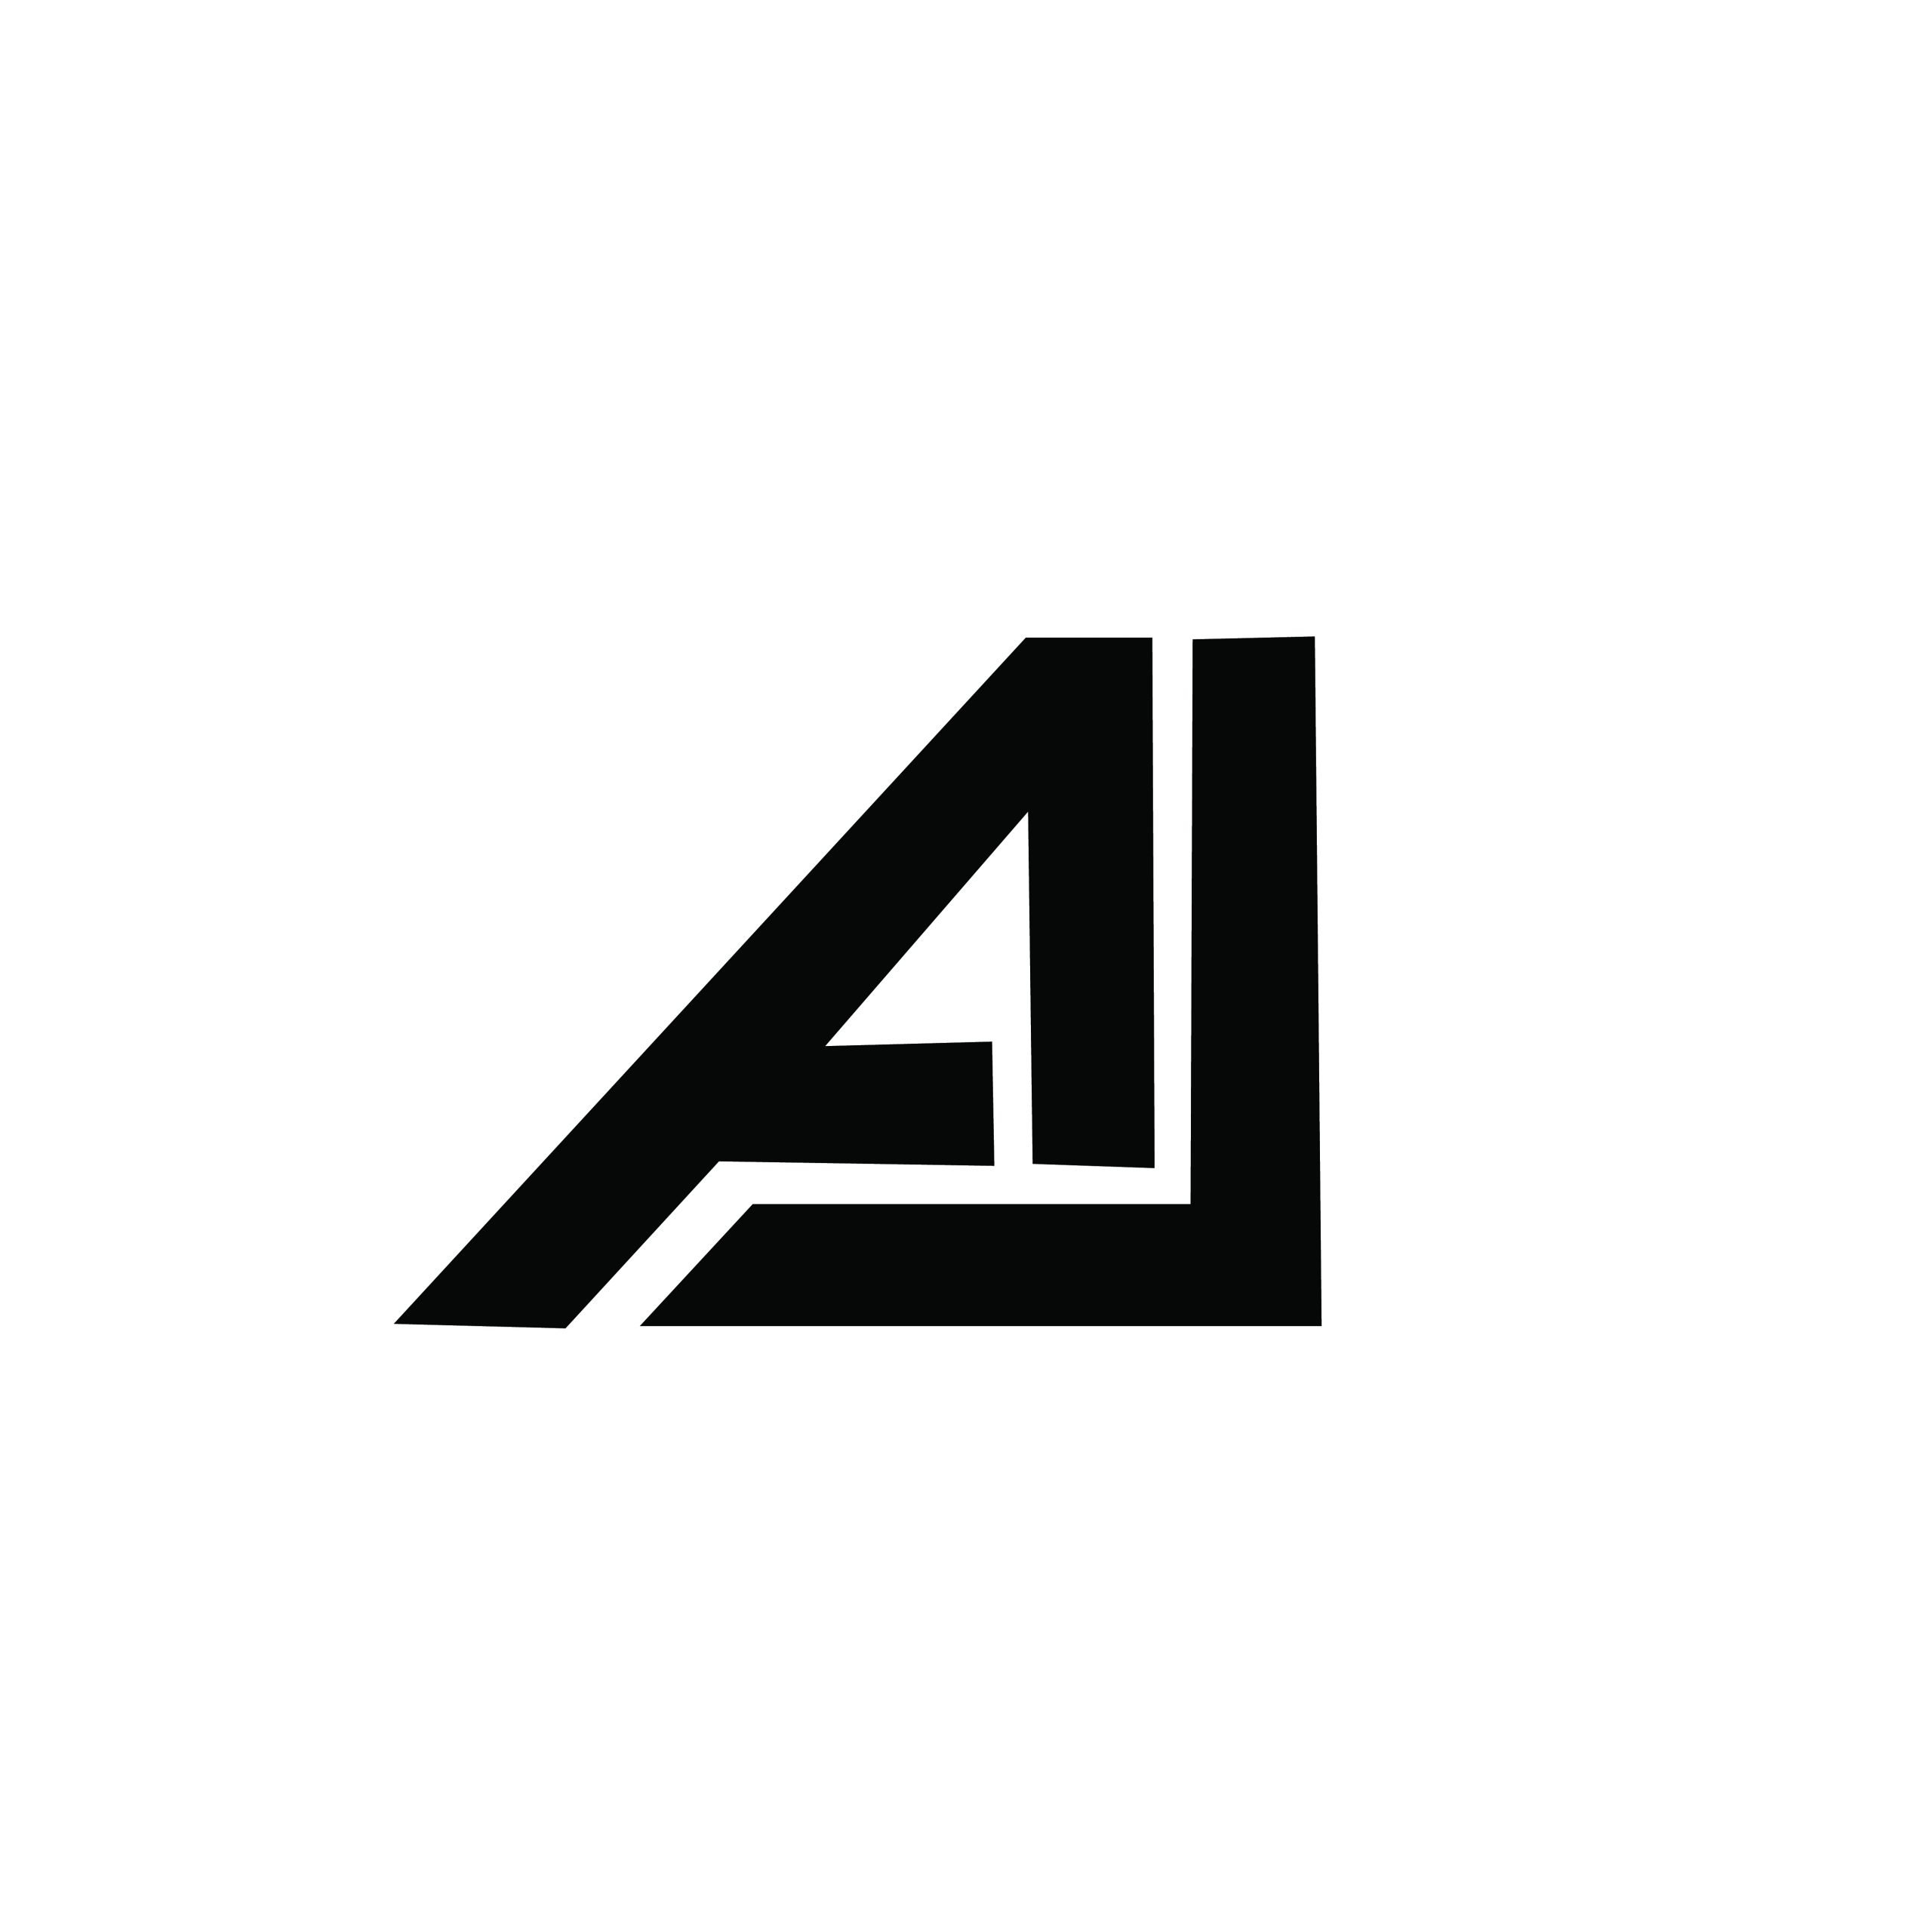 A J letter logo